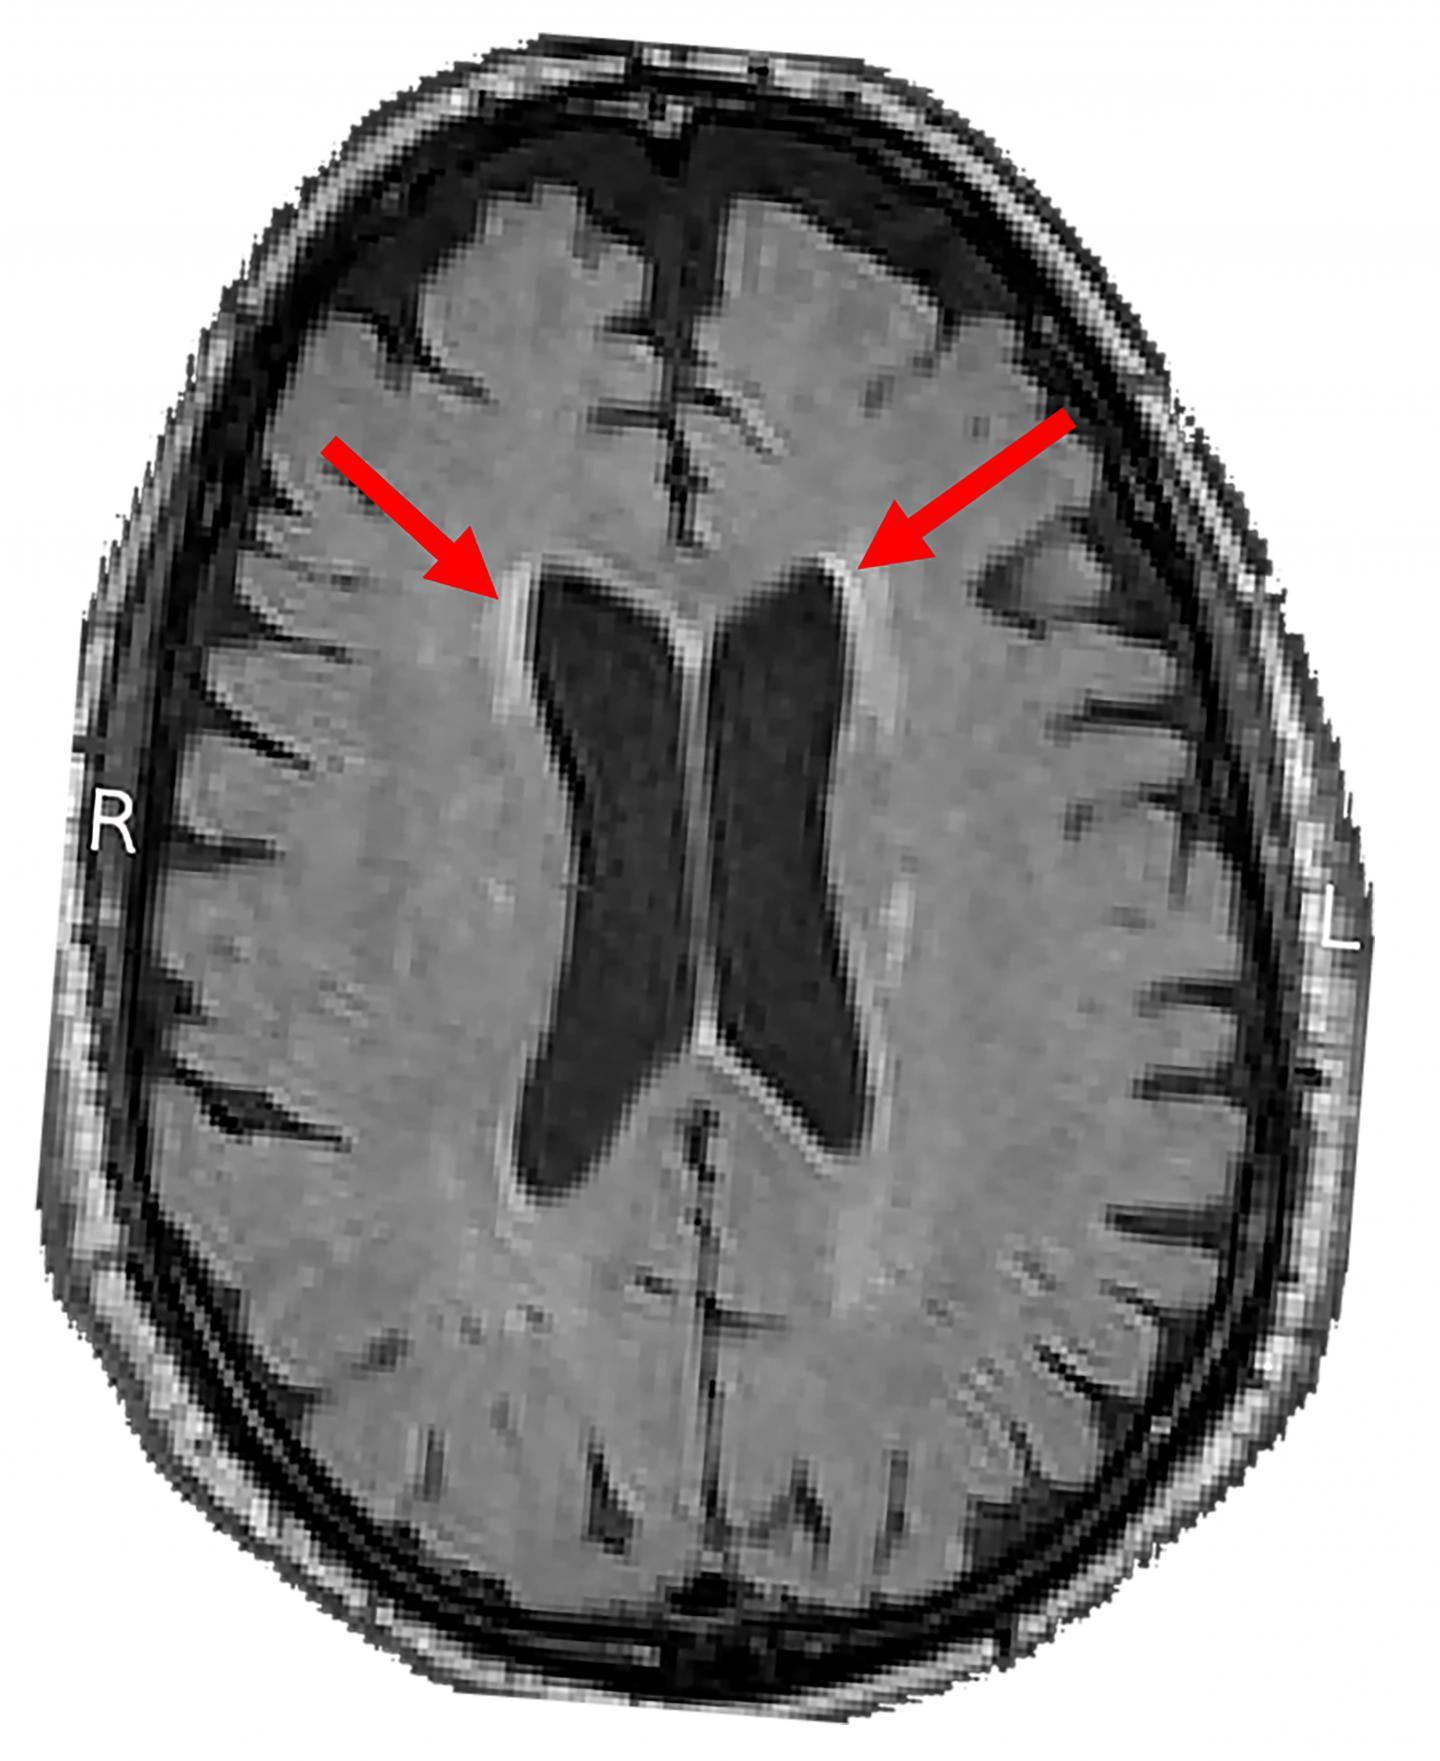 Intensive blood pressure control may slow age-related brain damage | EurekAlert! Science News